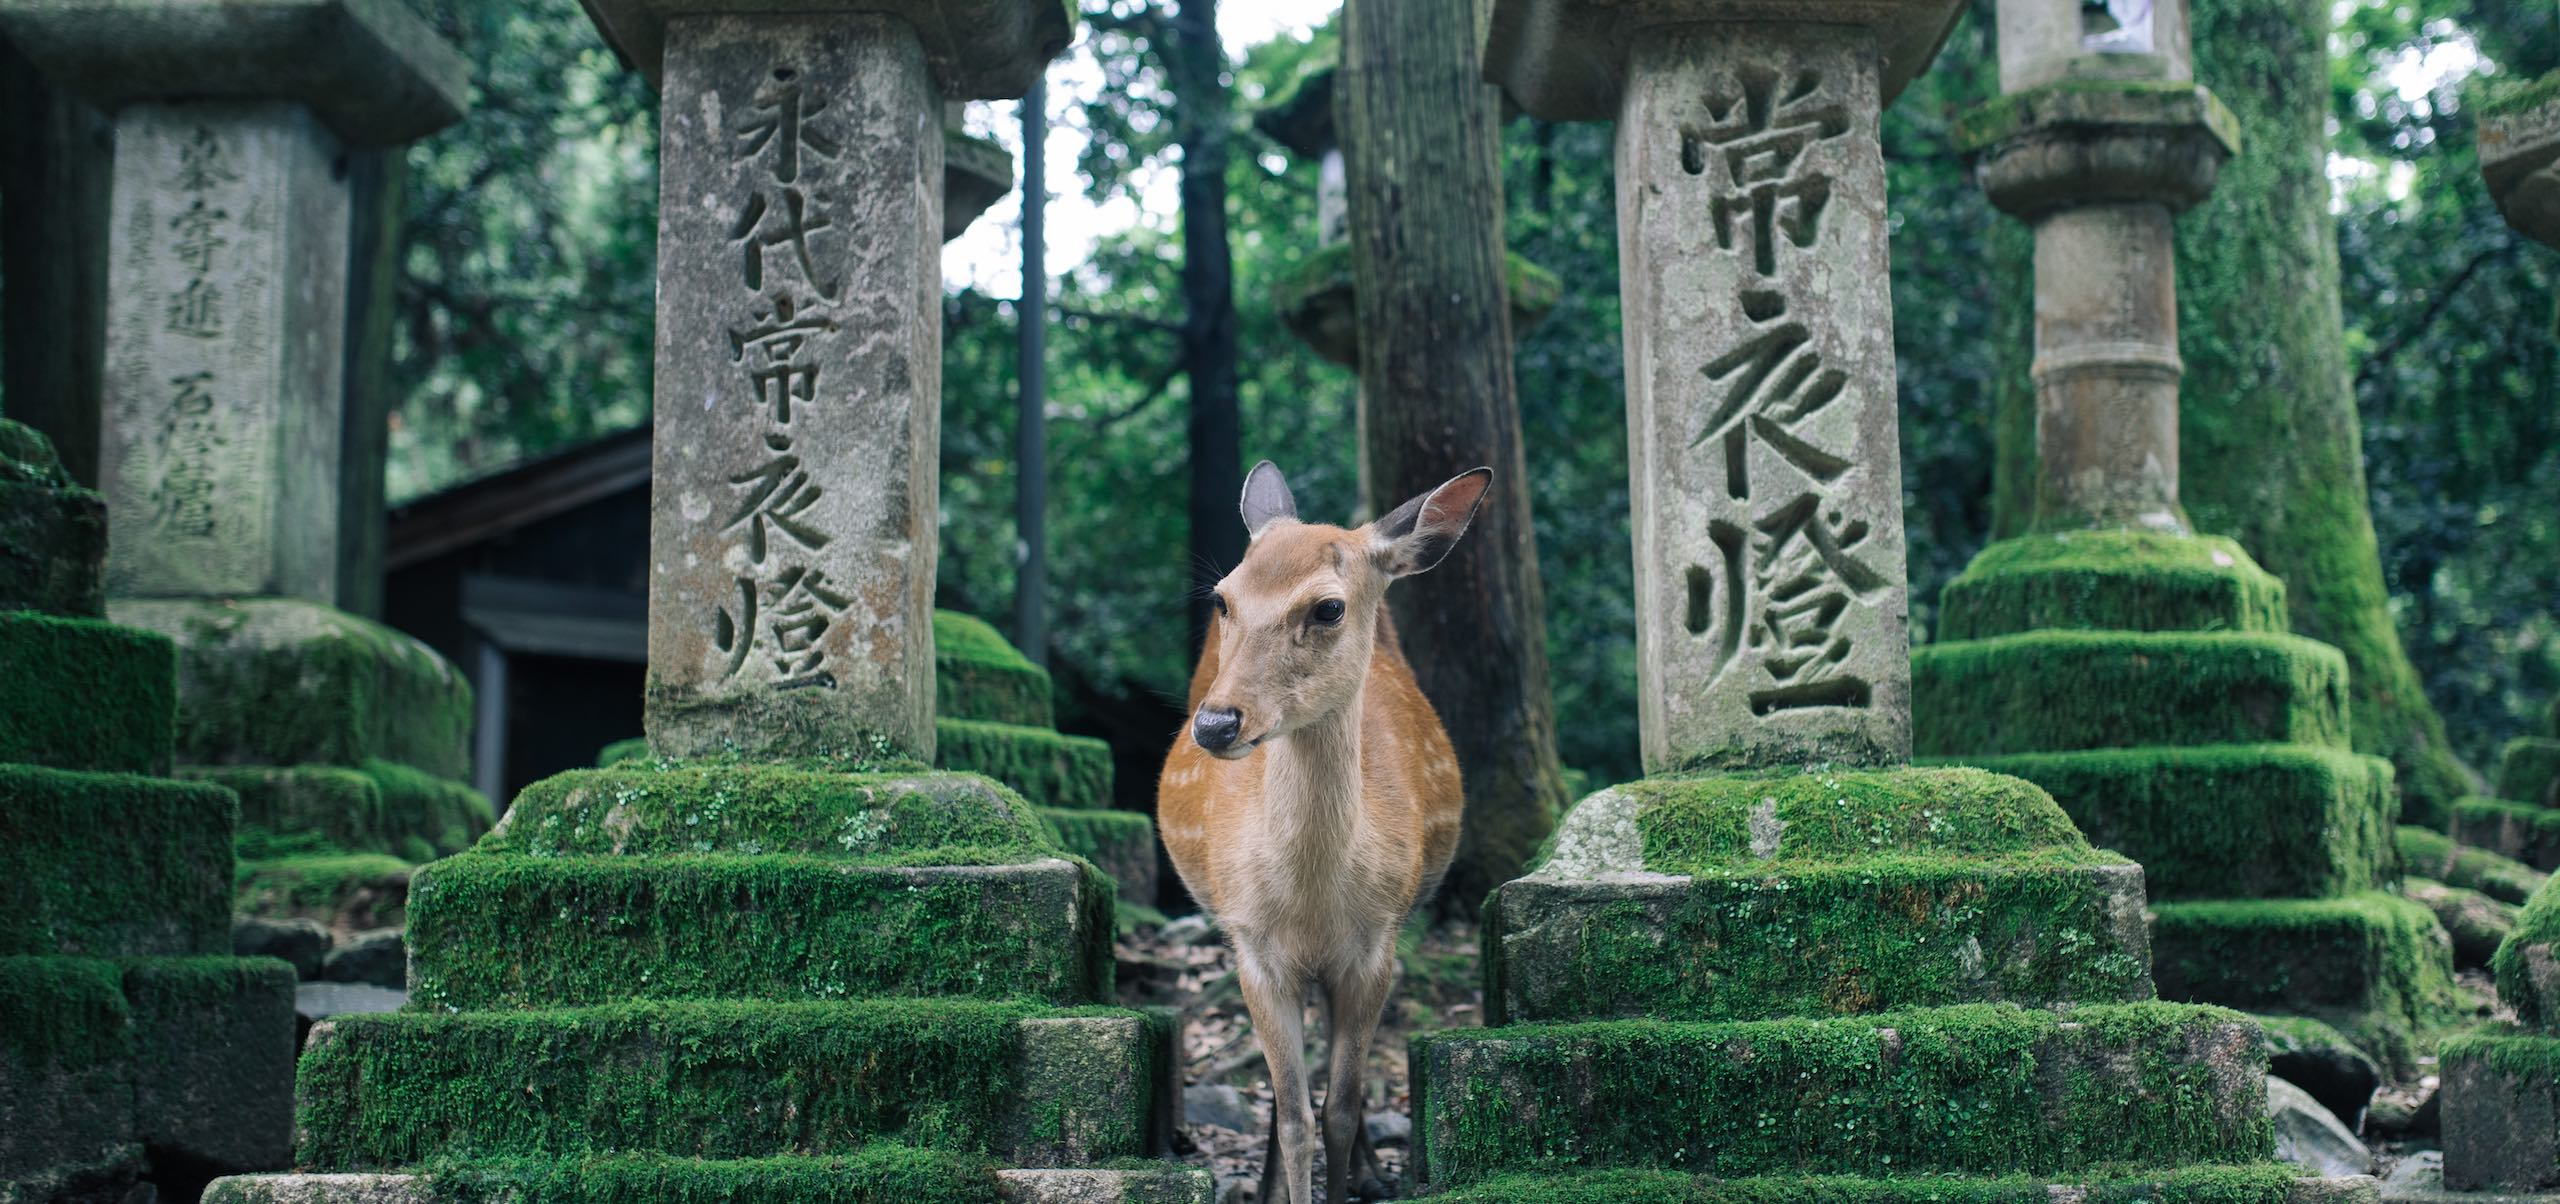 Nara Park | Photo: Joey Huang